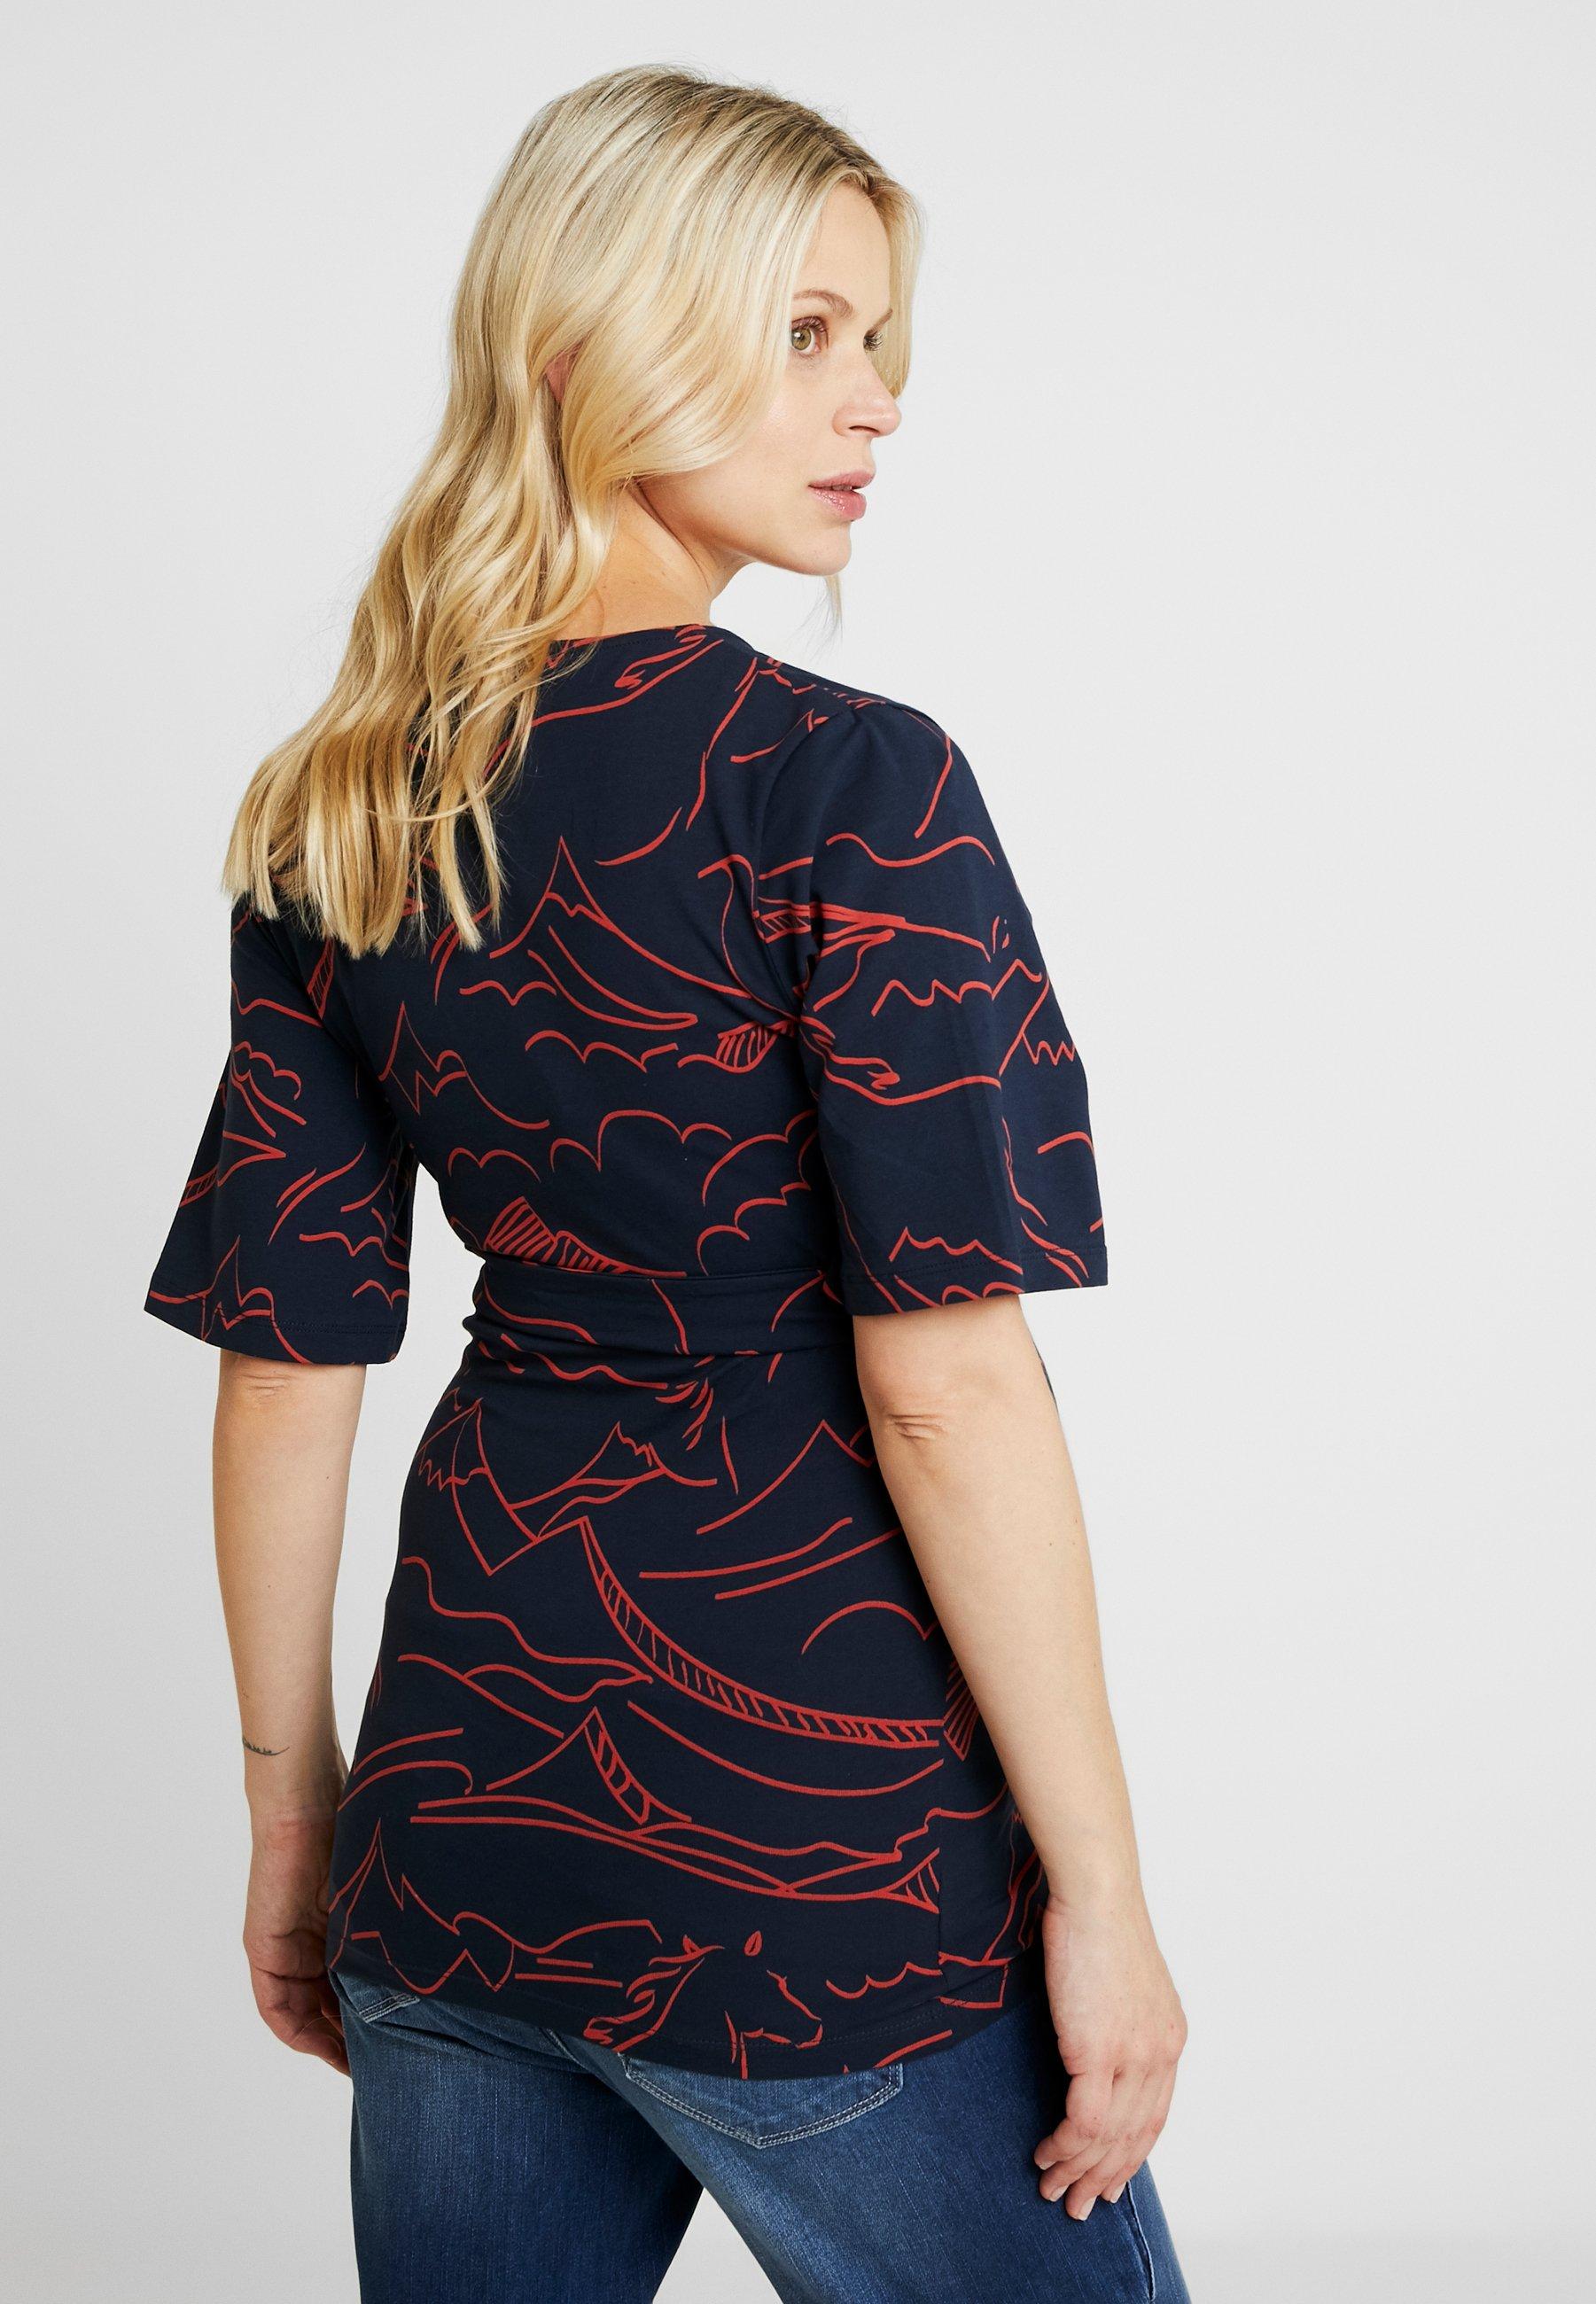 TessT Mljamaia shirt Navy Mamalicious Imprimé Blazer SUpqVzGM